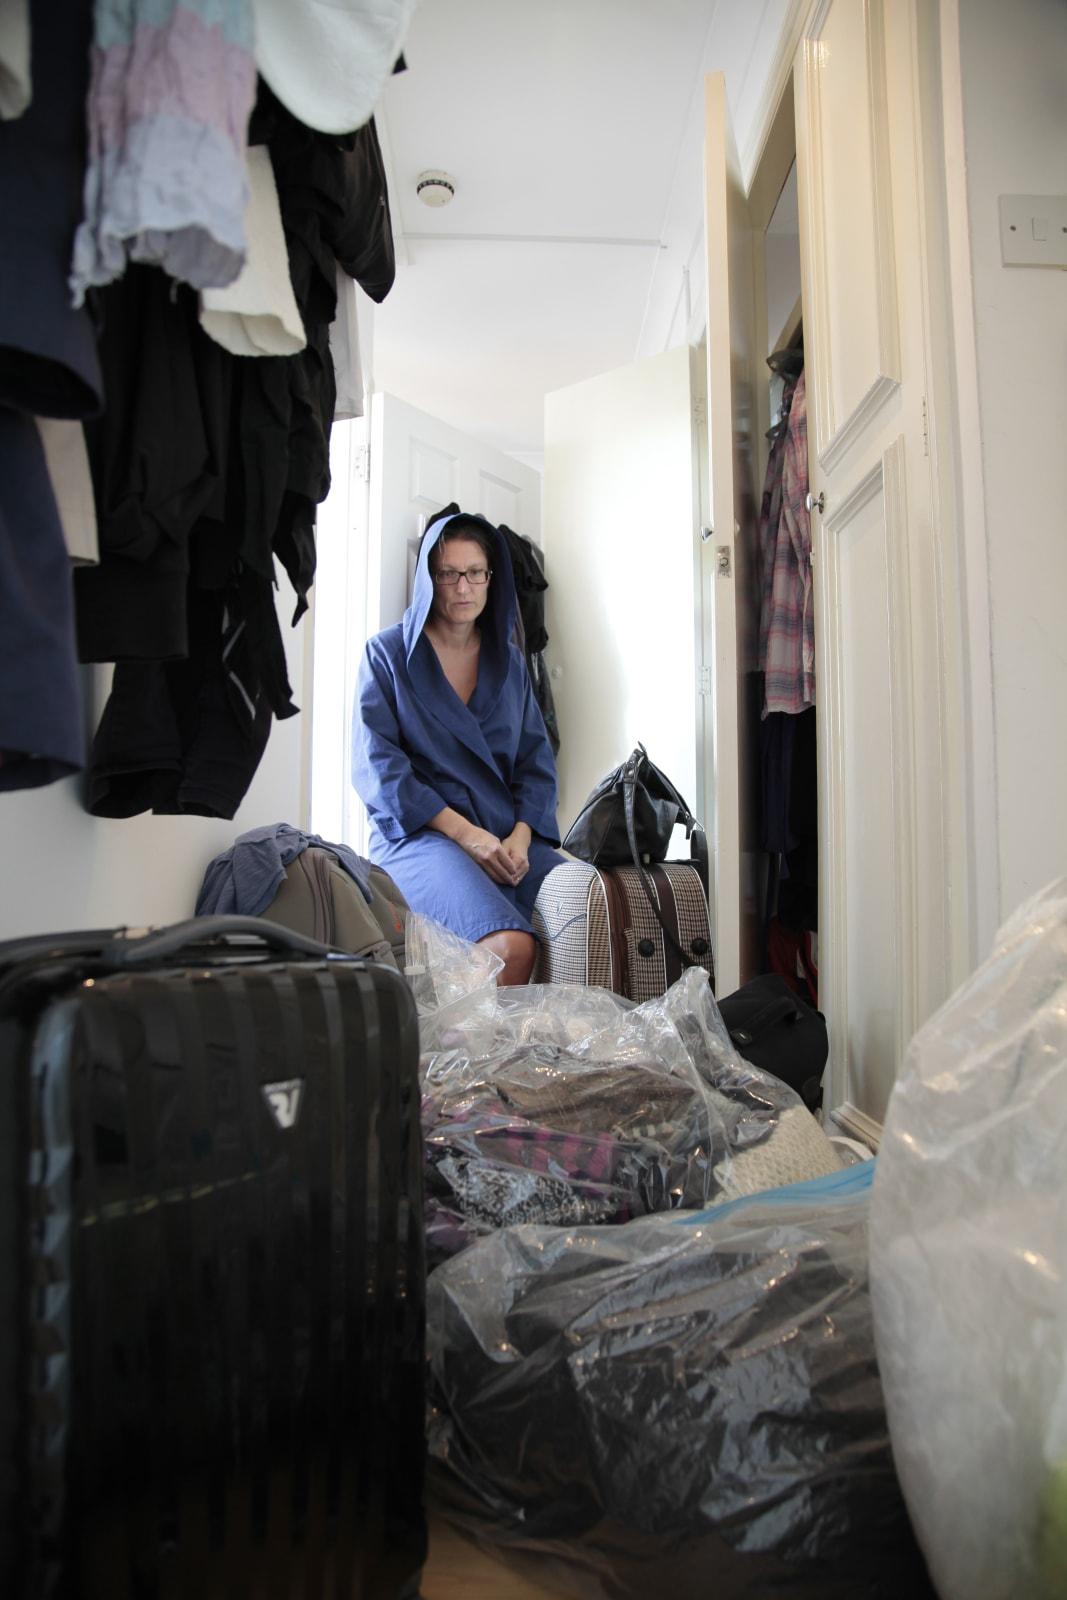 Lichena Bertinato, I live here Pic. No. 9, 2015